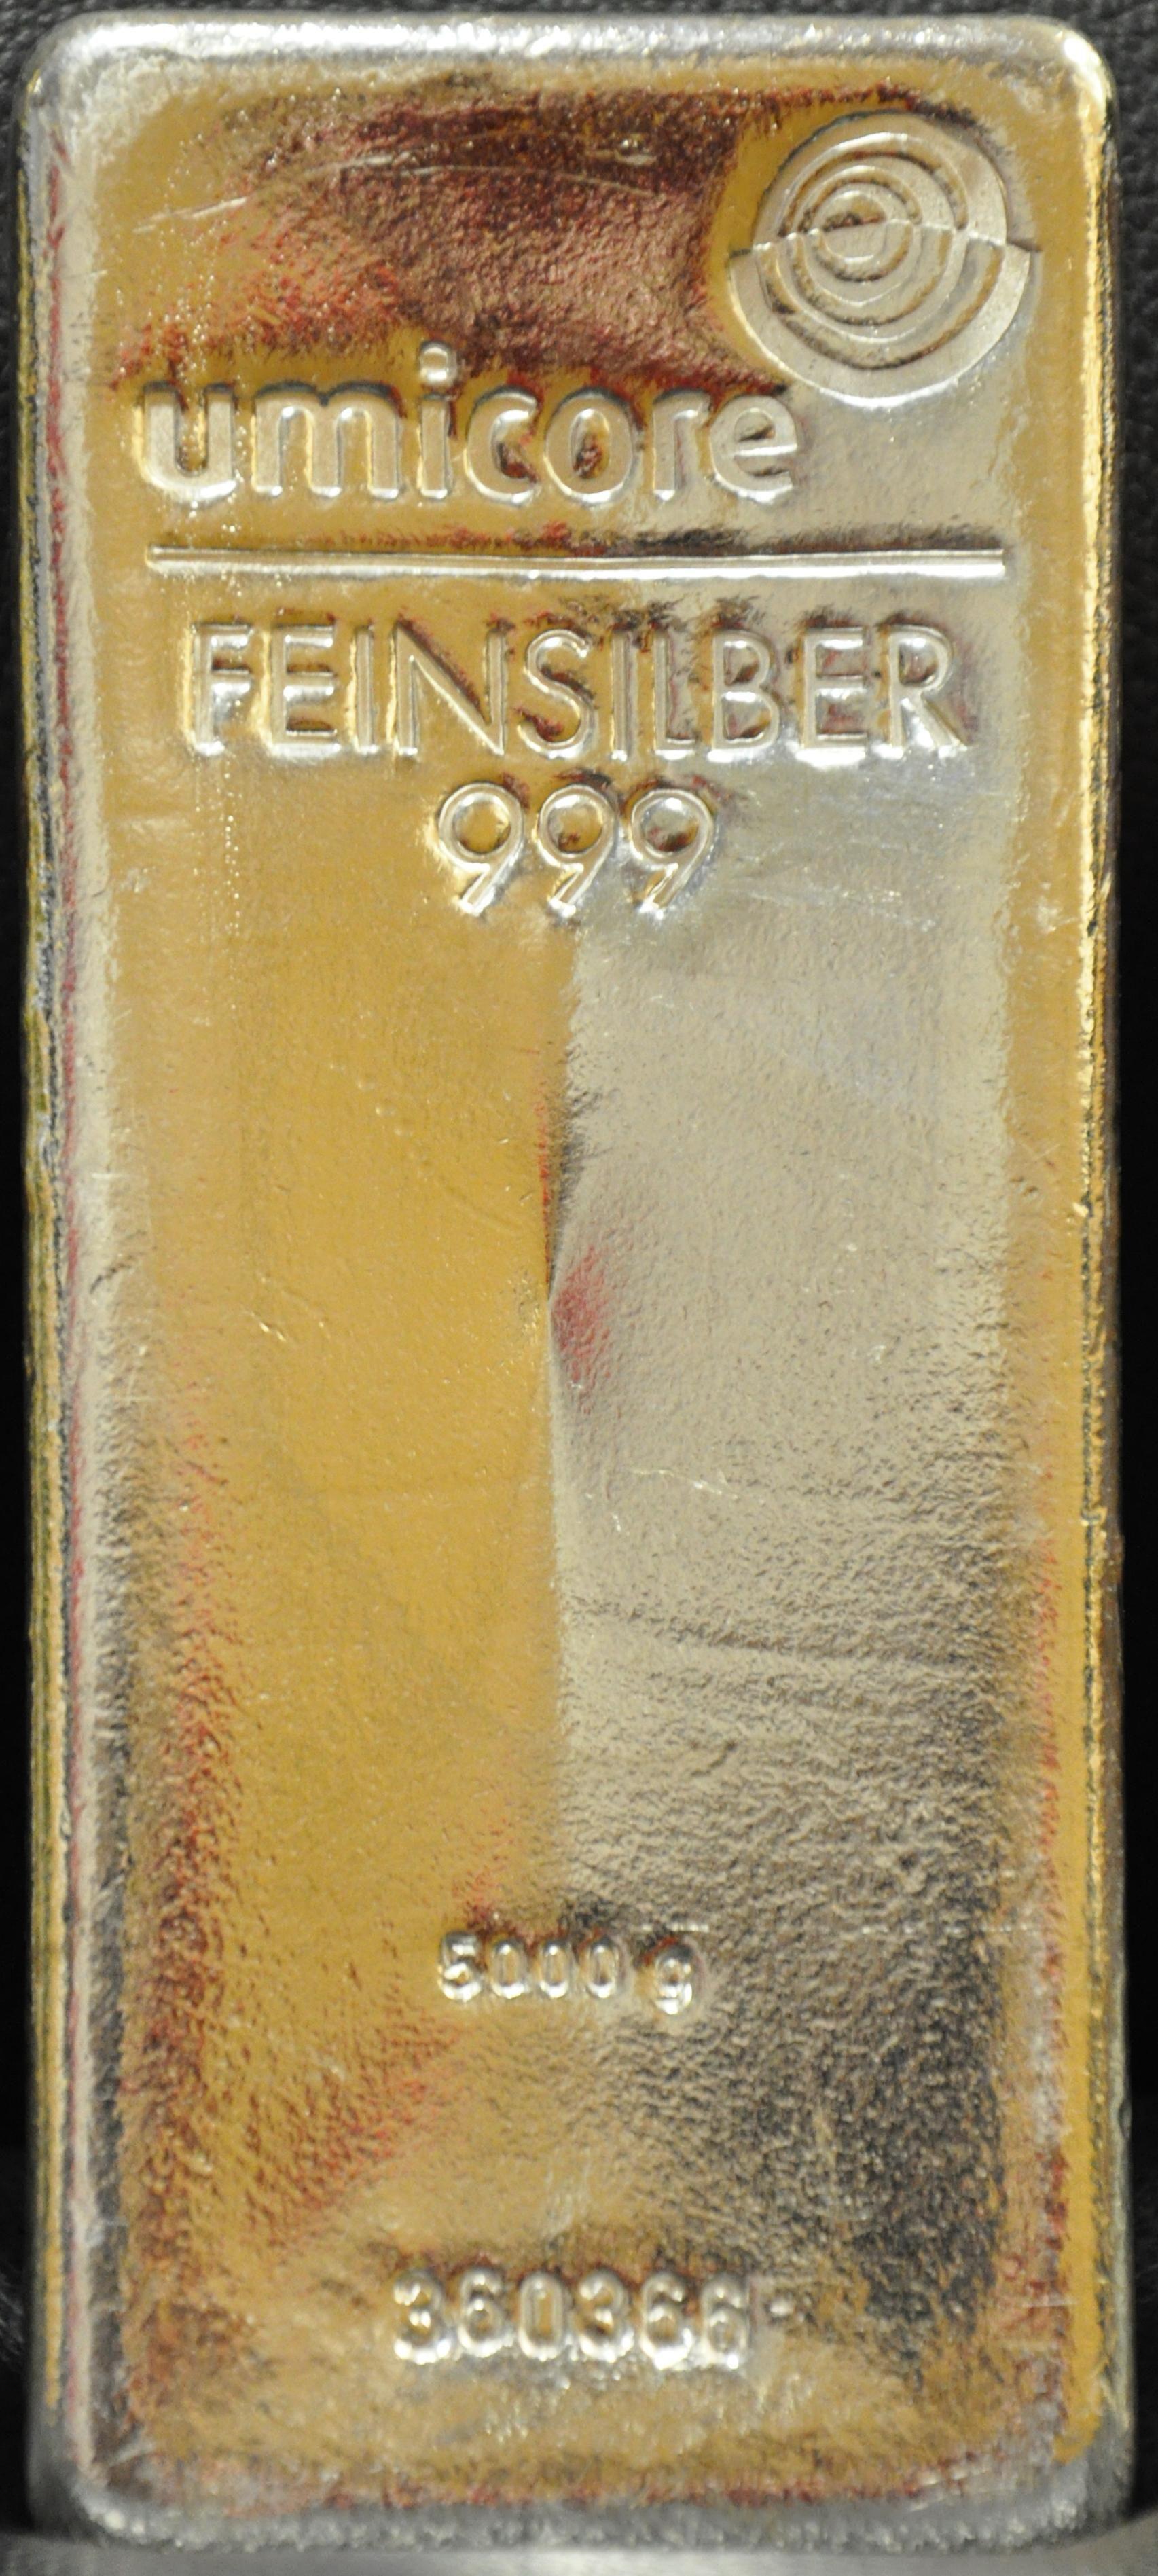 5000 Grams Silver Bar Bullion Store Buy Gold And Silver Gold Bullion Bars Gold Bullion Coins